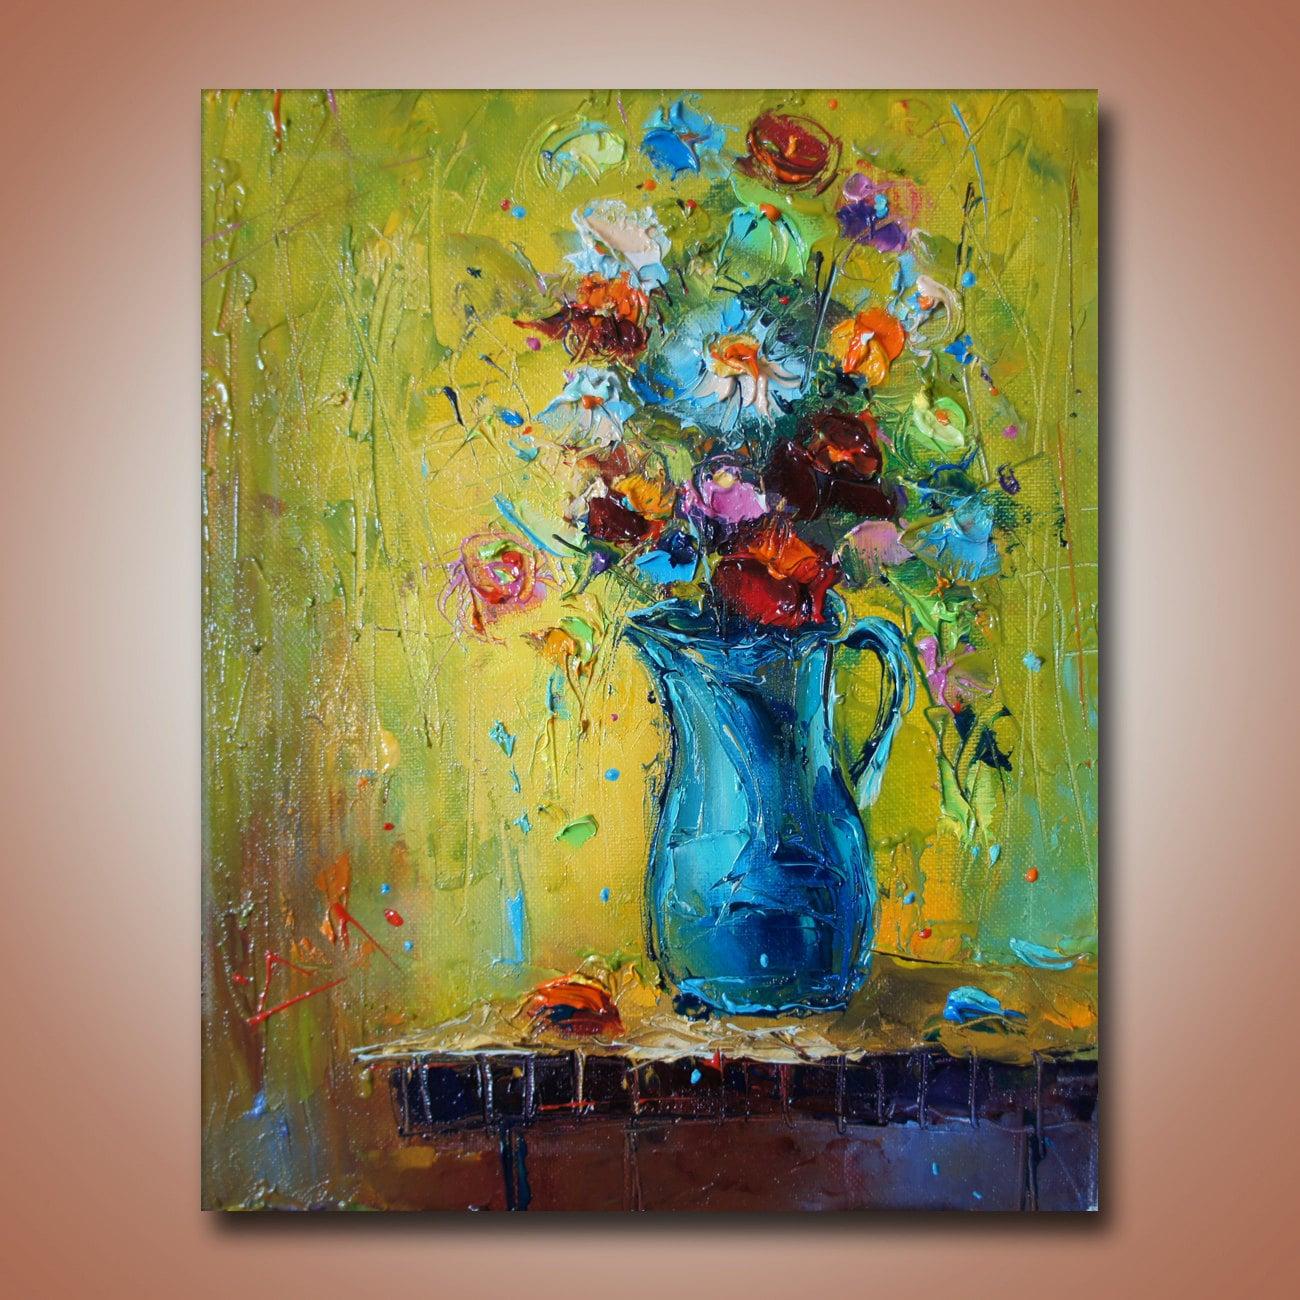 SPACHTEL Blumenkunst Ölgemälde Original-Artworks moderne